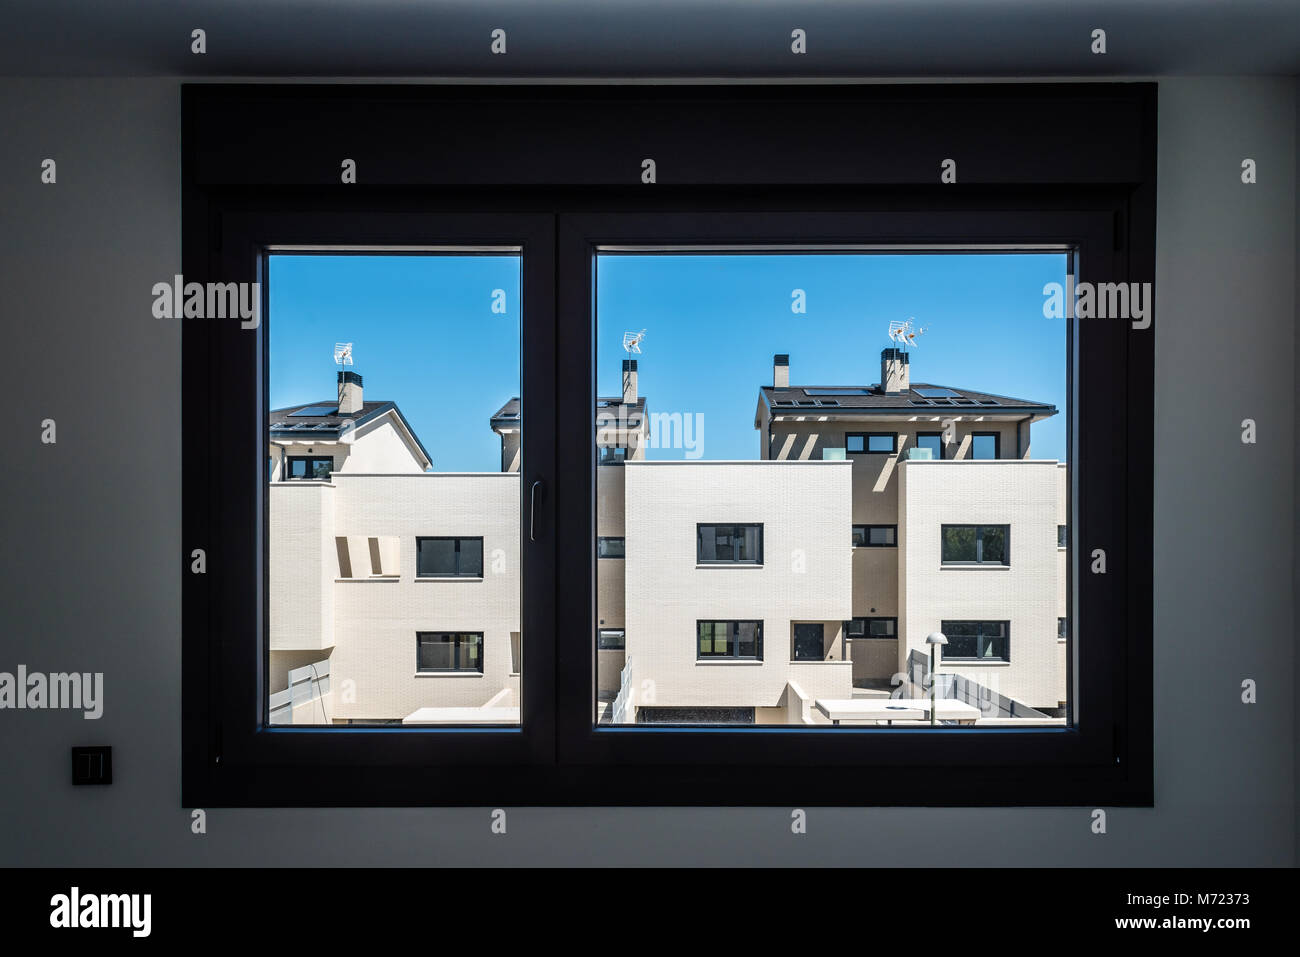 Framed View Stockfotos & Framed View Bilder - Alamy